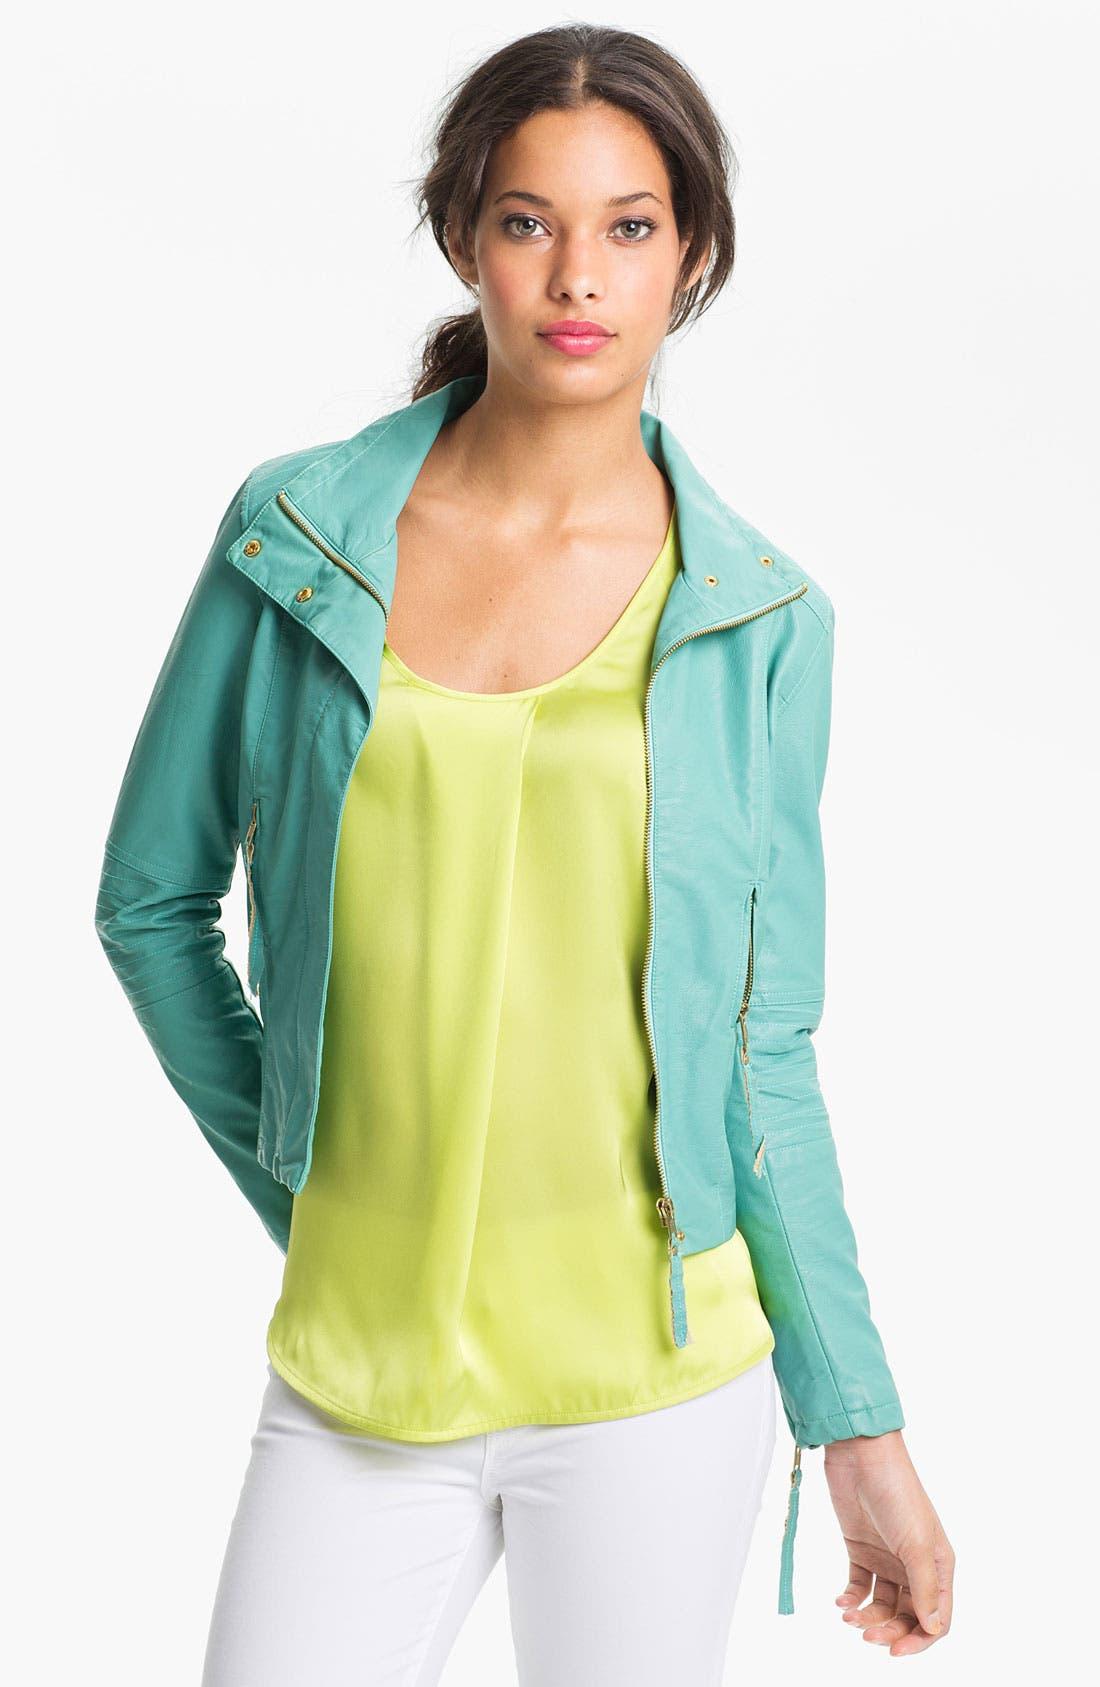 Alternate Image 1 Selected - KUT from the Kloth 'Elana' Faux Leather Scuba Jacket